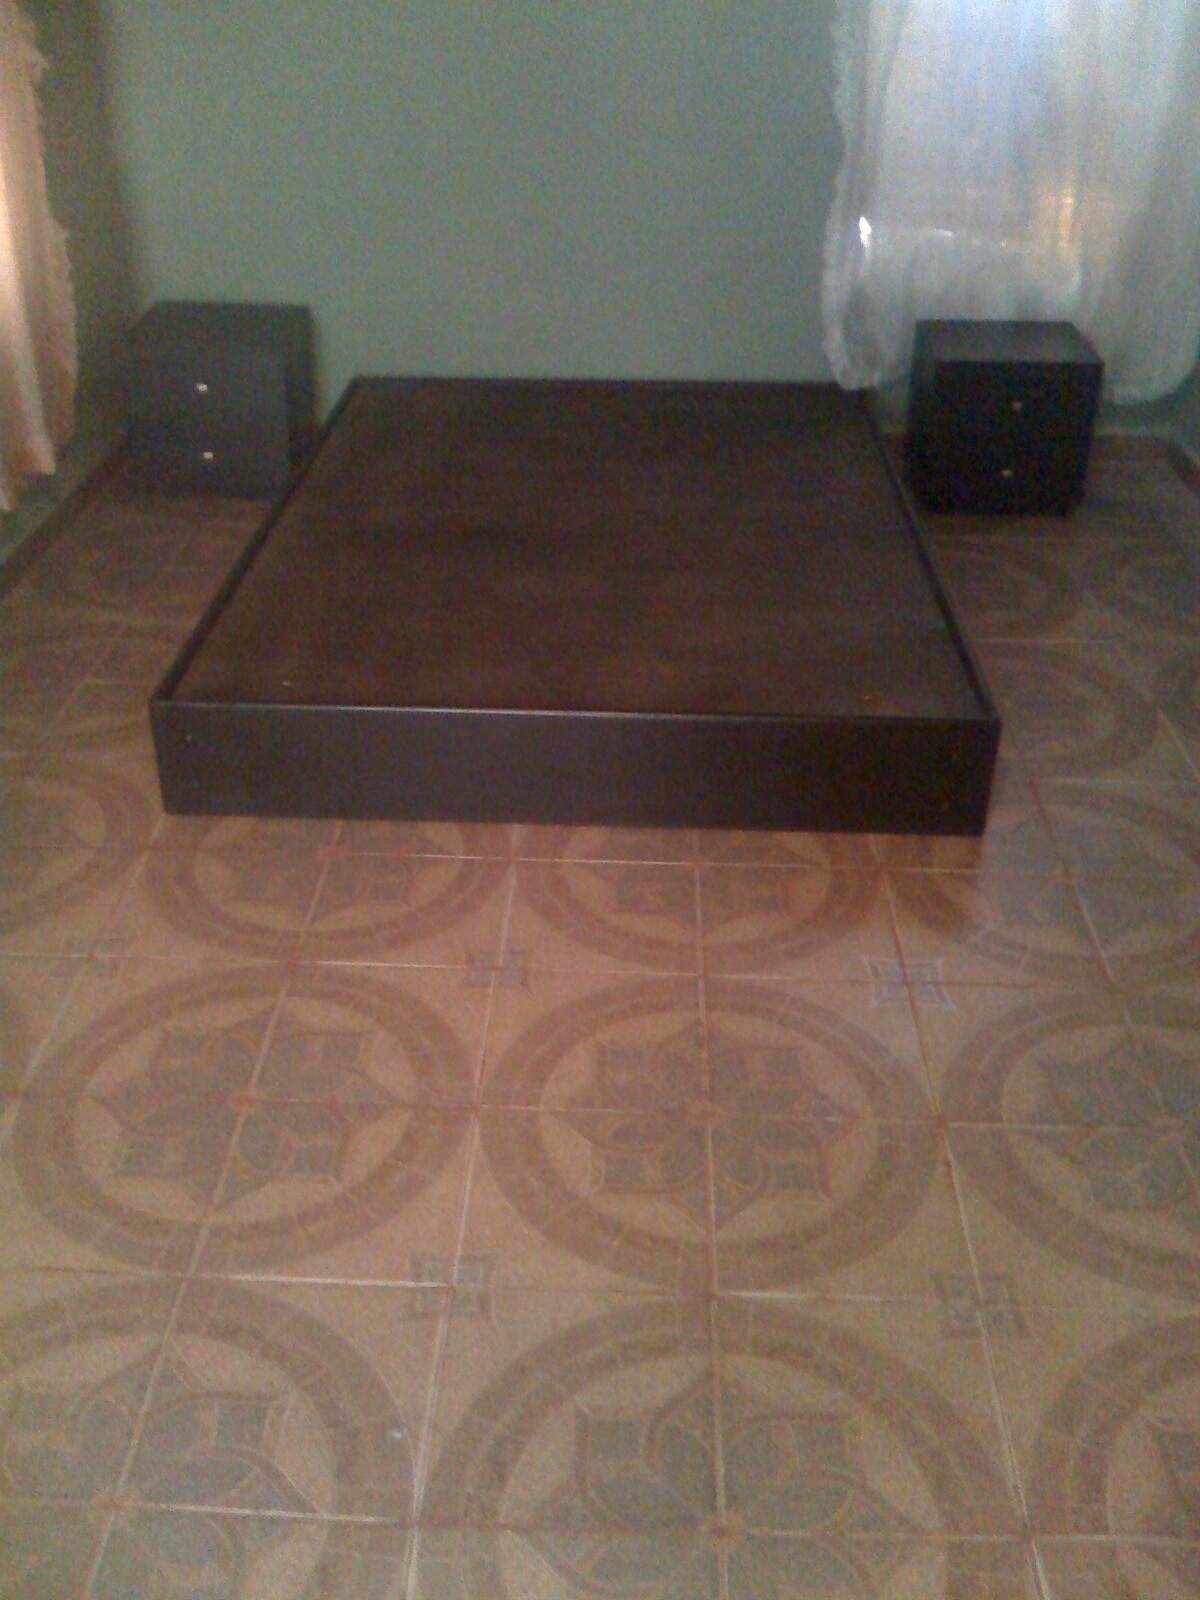 Carpinteria base de cama individual con cajones tipo rusticos for Base cama individual con cajones